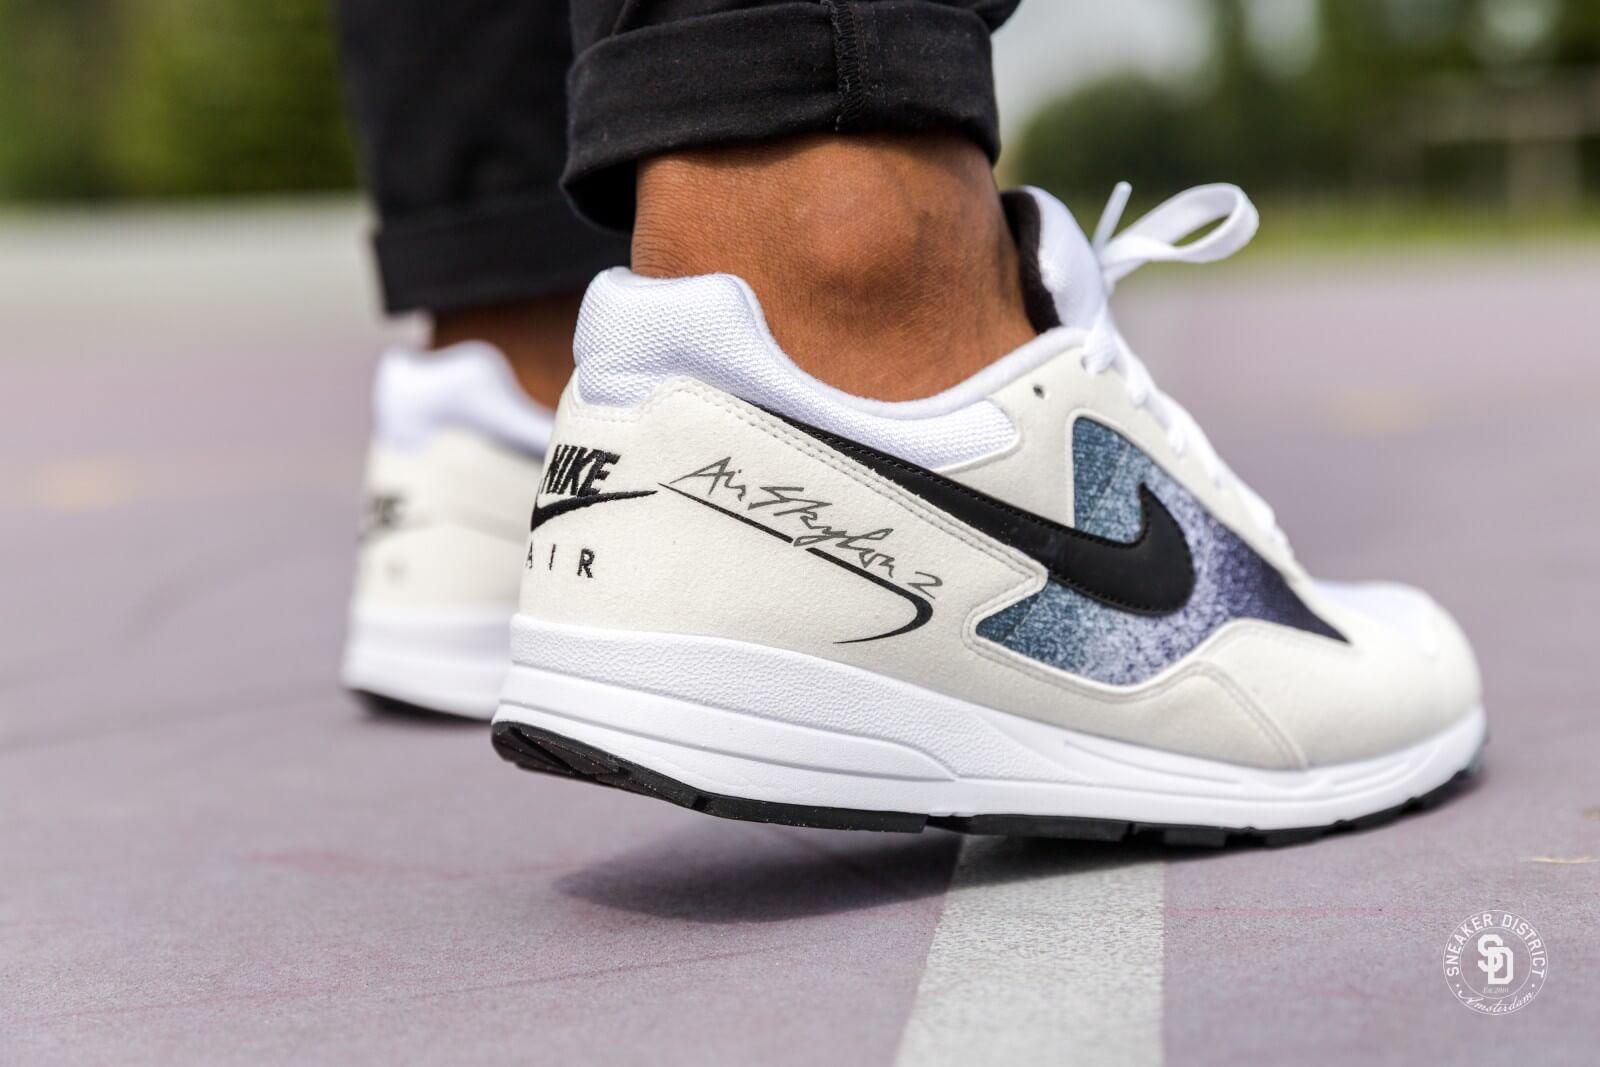 Nike Air Skylon II White/Black-Grey